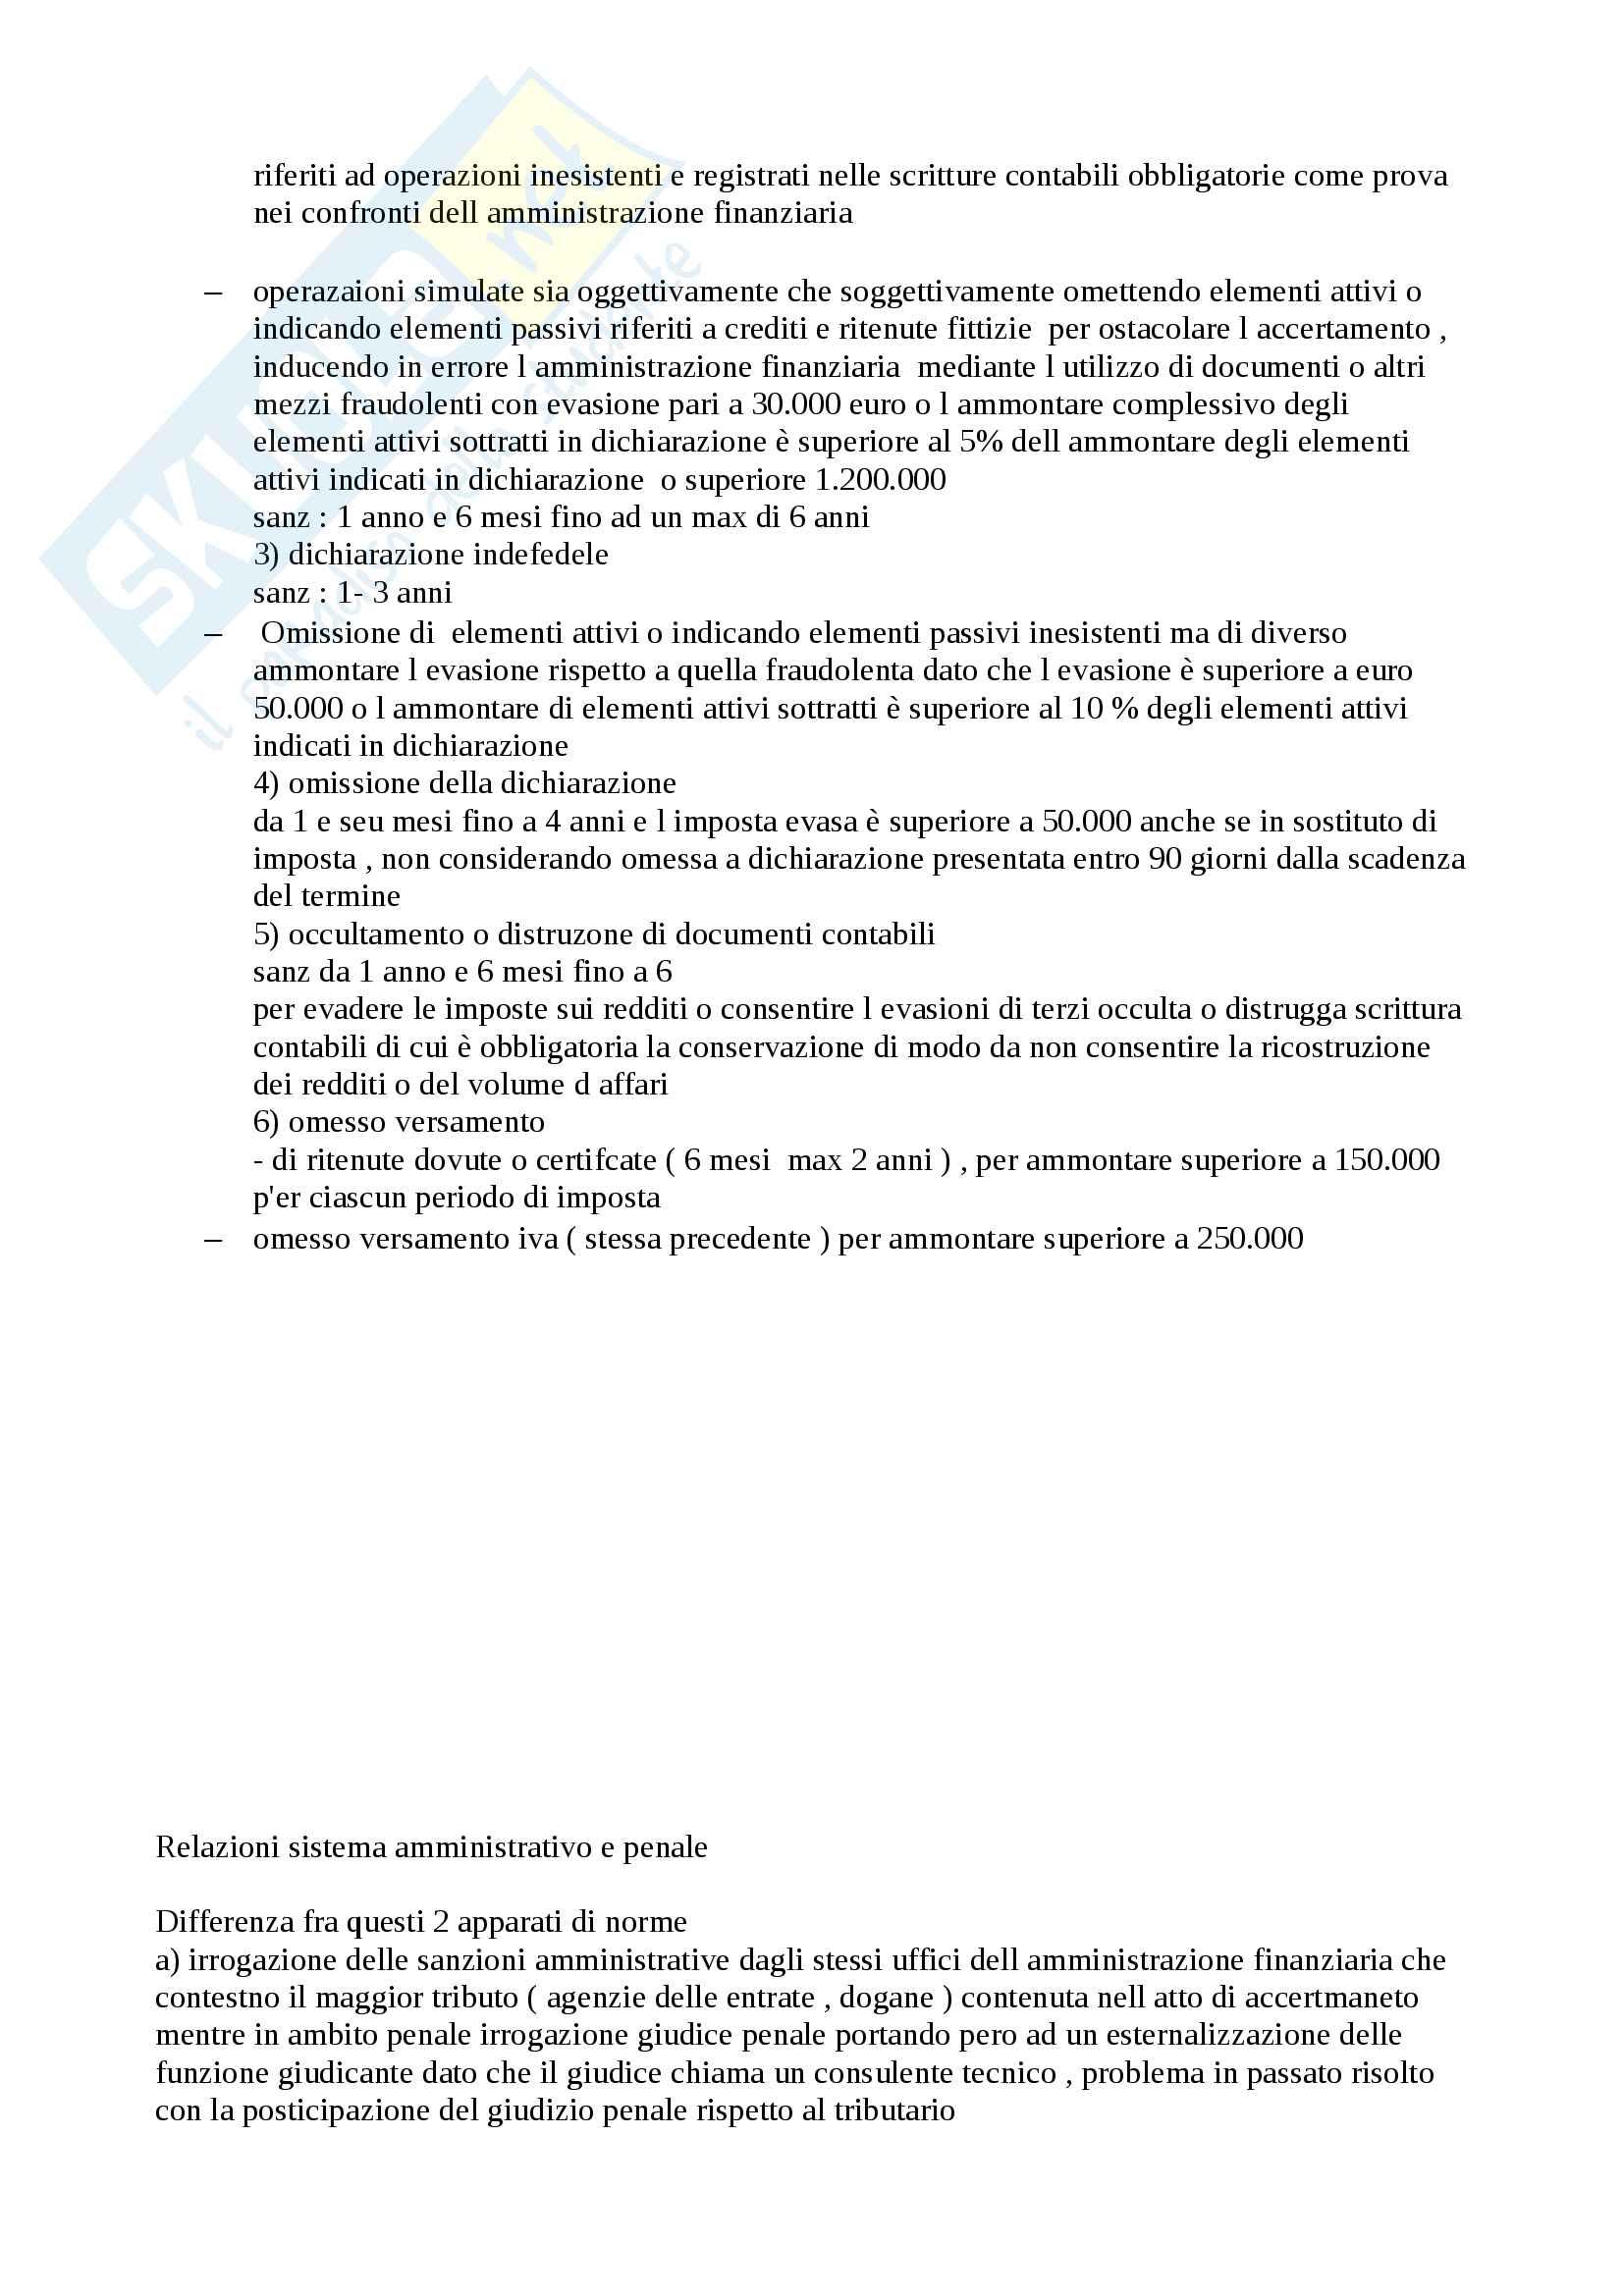 Appunti sintesi utilissima per esame diritto tributario proff.Selicato, Uricchio Pag. 76